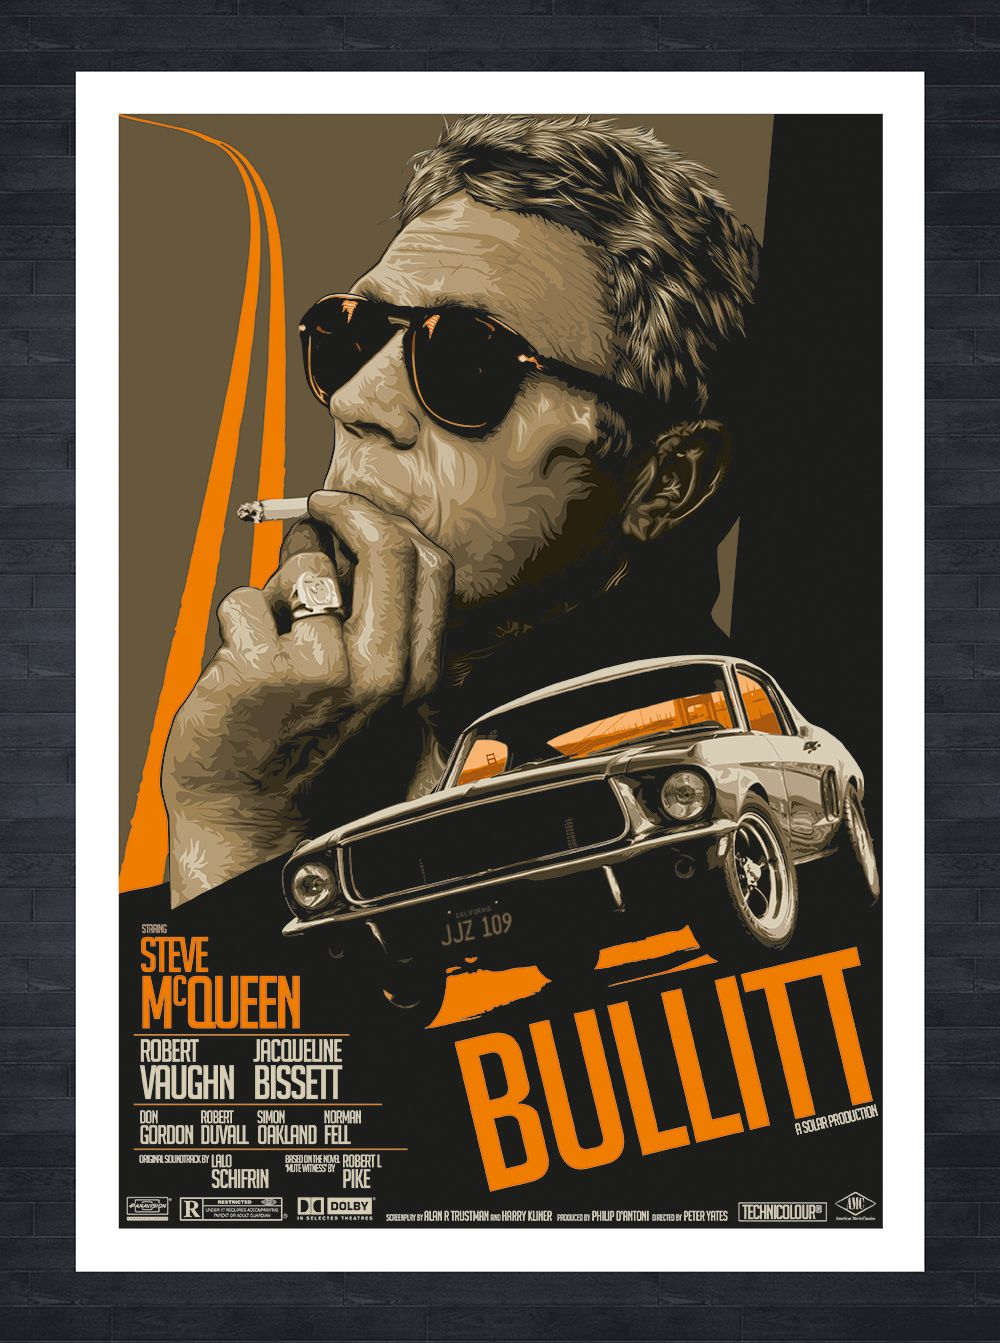 Home gt steve mcqueen porsche paintings - Bullitt Fictional Movie Film Poster Featuring Steve Mcqueen And The 1968 Ford Mustang Gt